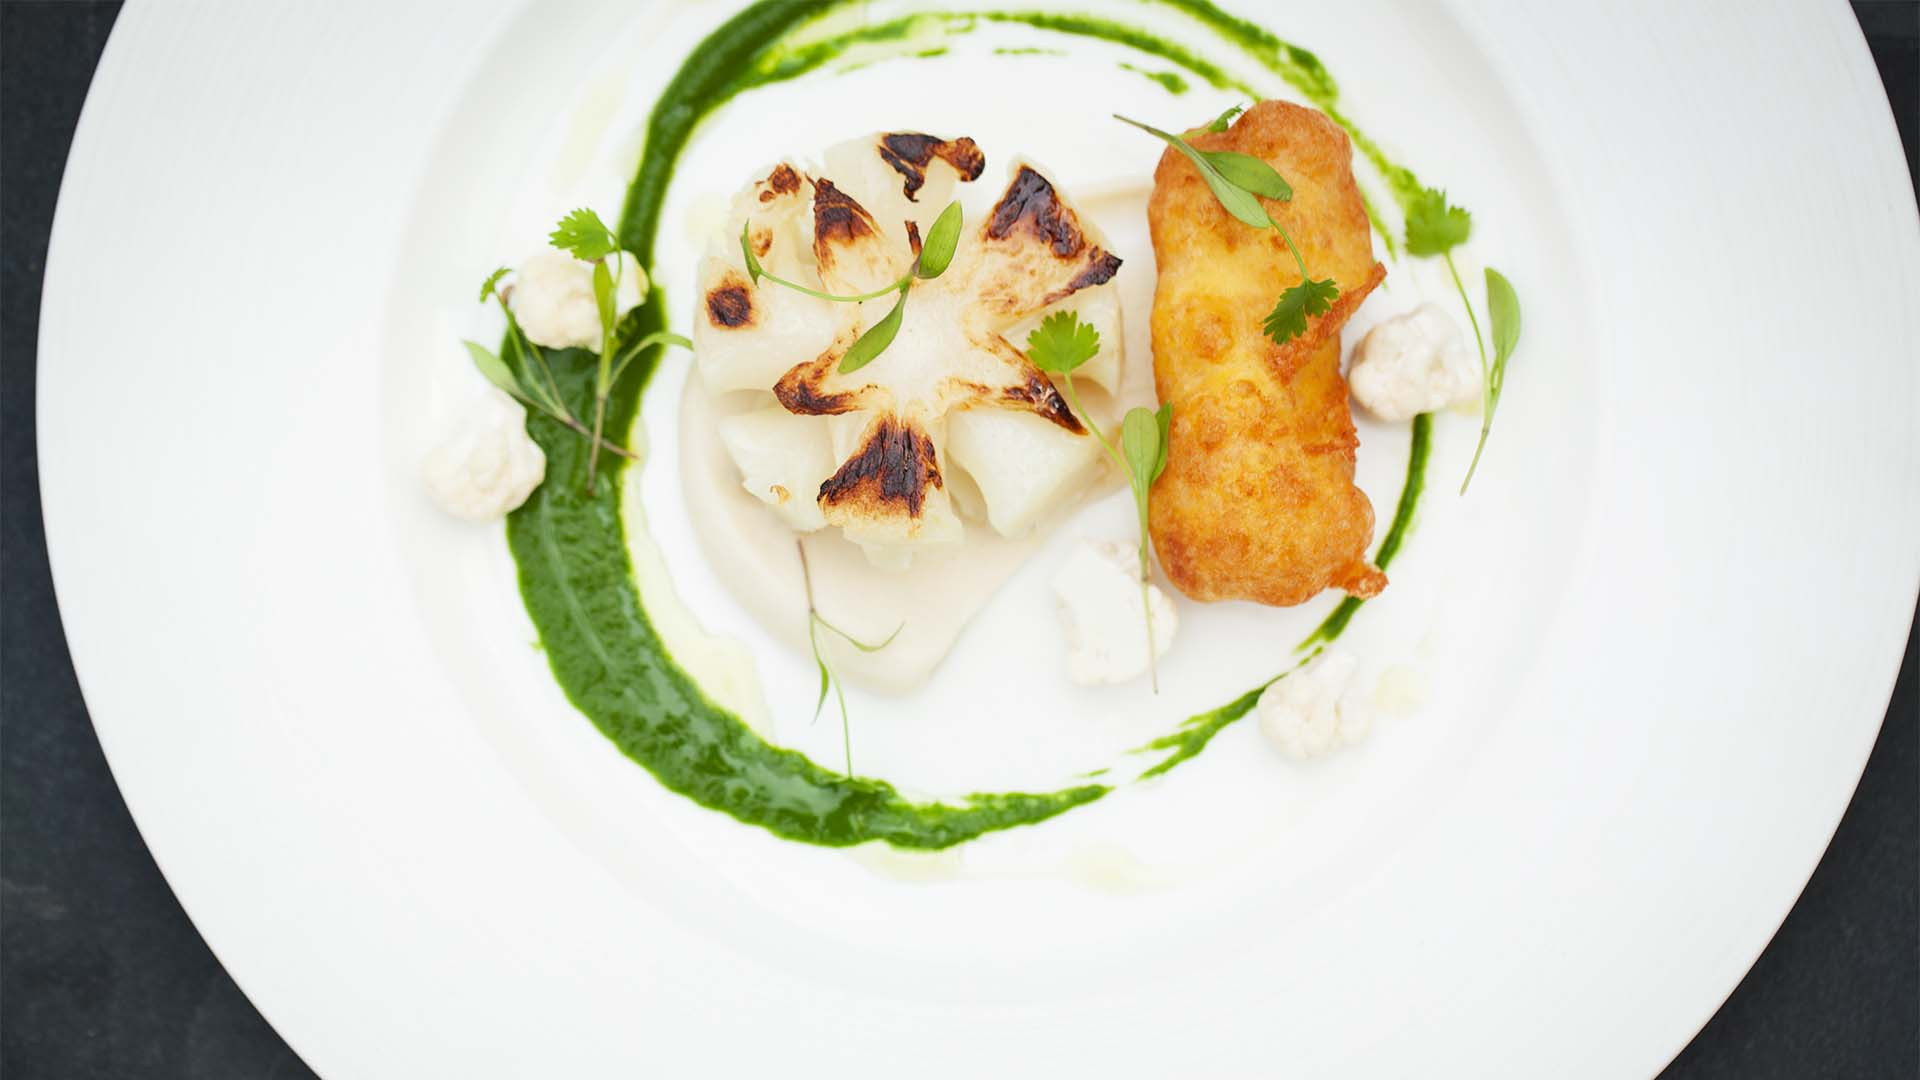 Cauliflower and croquette at Acorn Vegetarian restaurant Bath